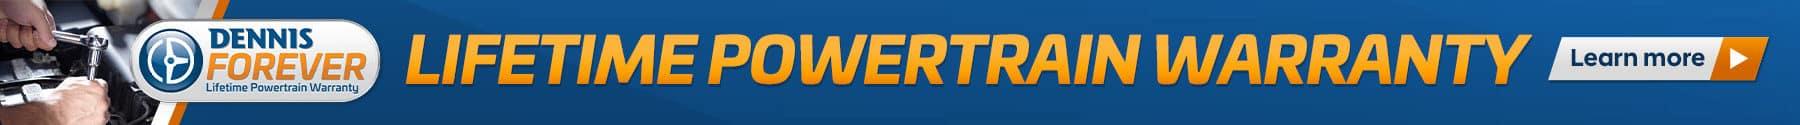 desktop homepage pencill banner